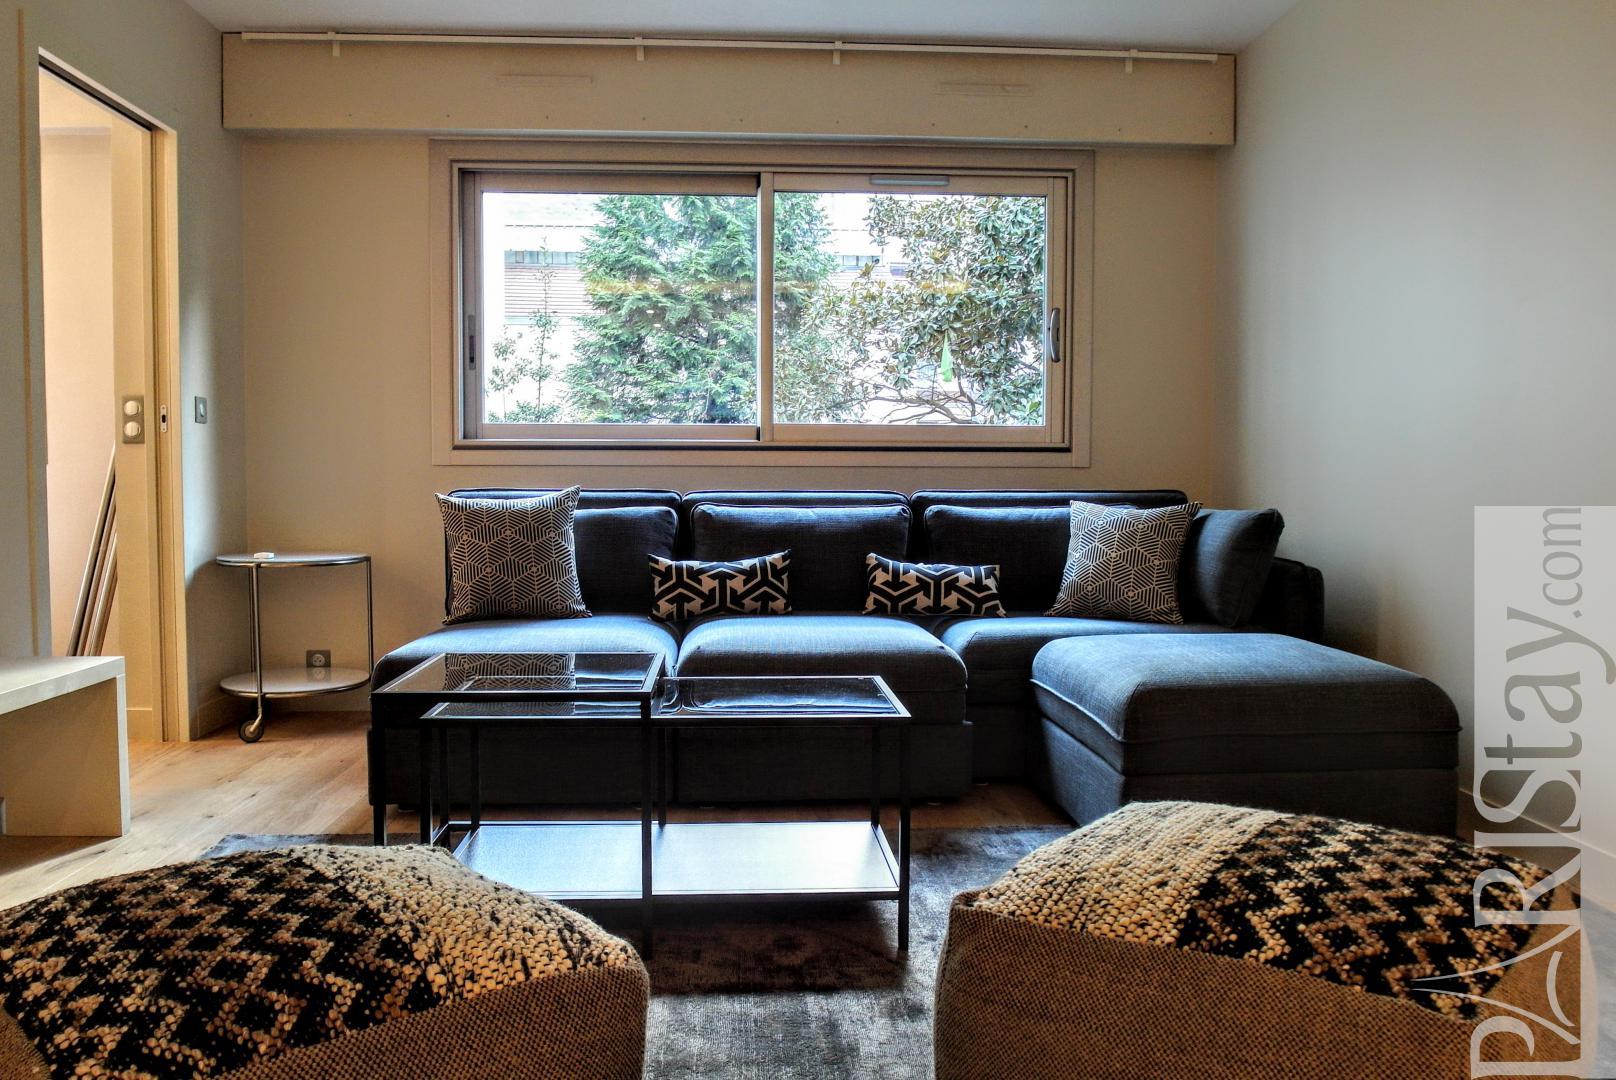 Paris Flat Long Term Rental Luxury 1 Bedroom Apartment For Rent